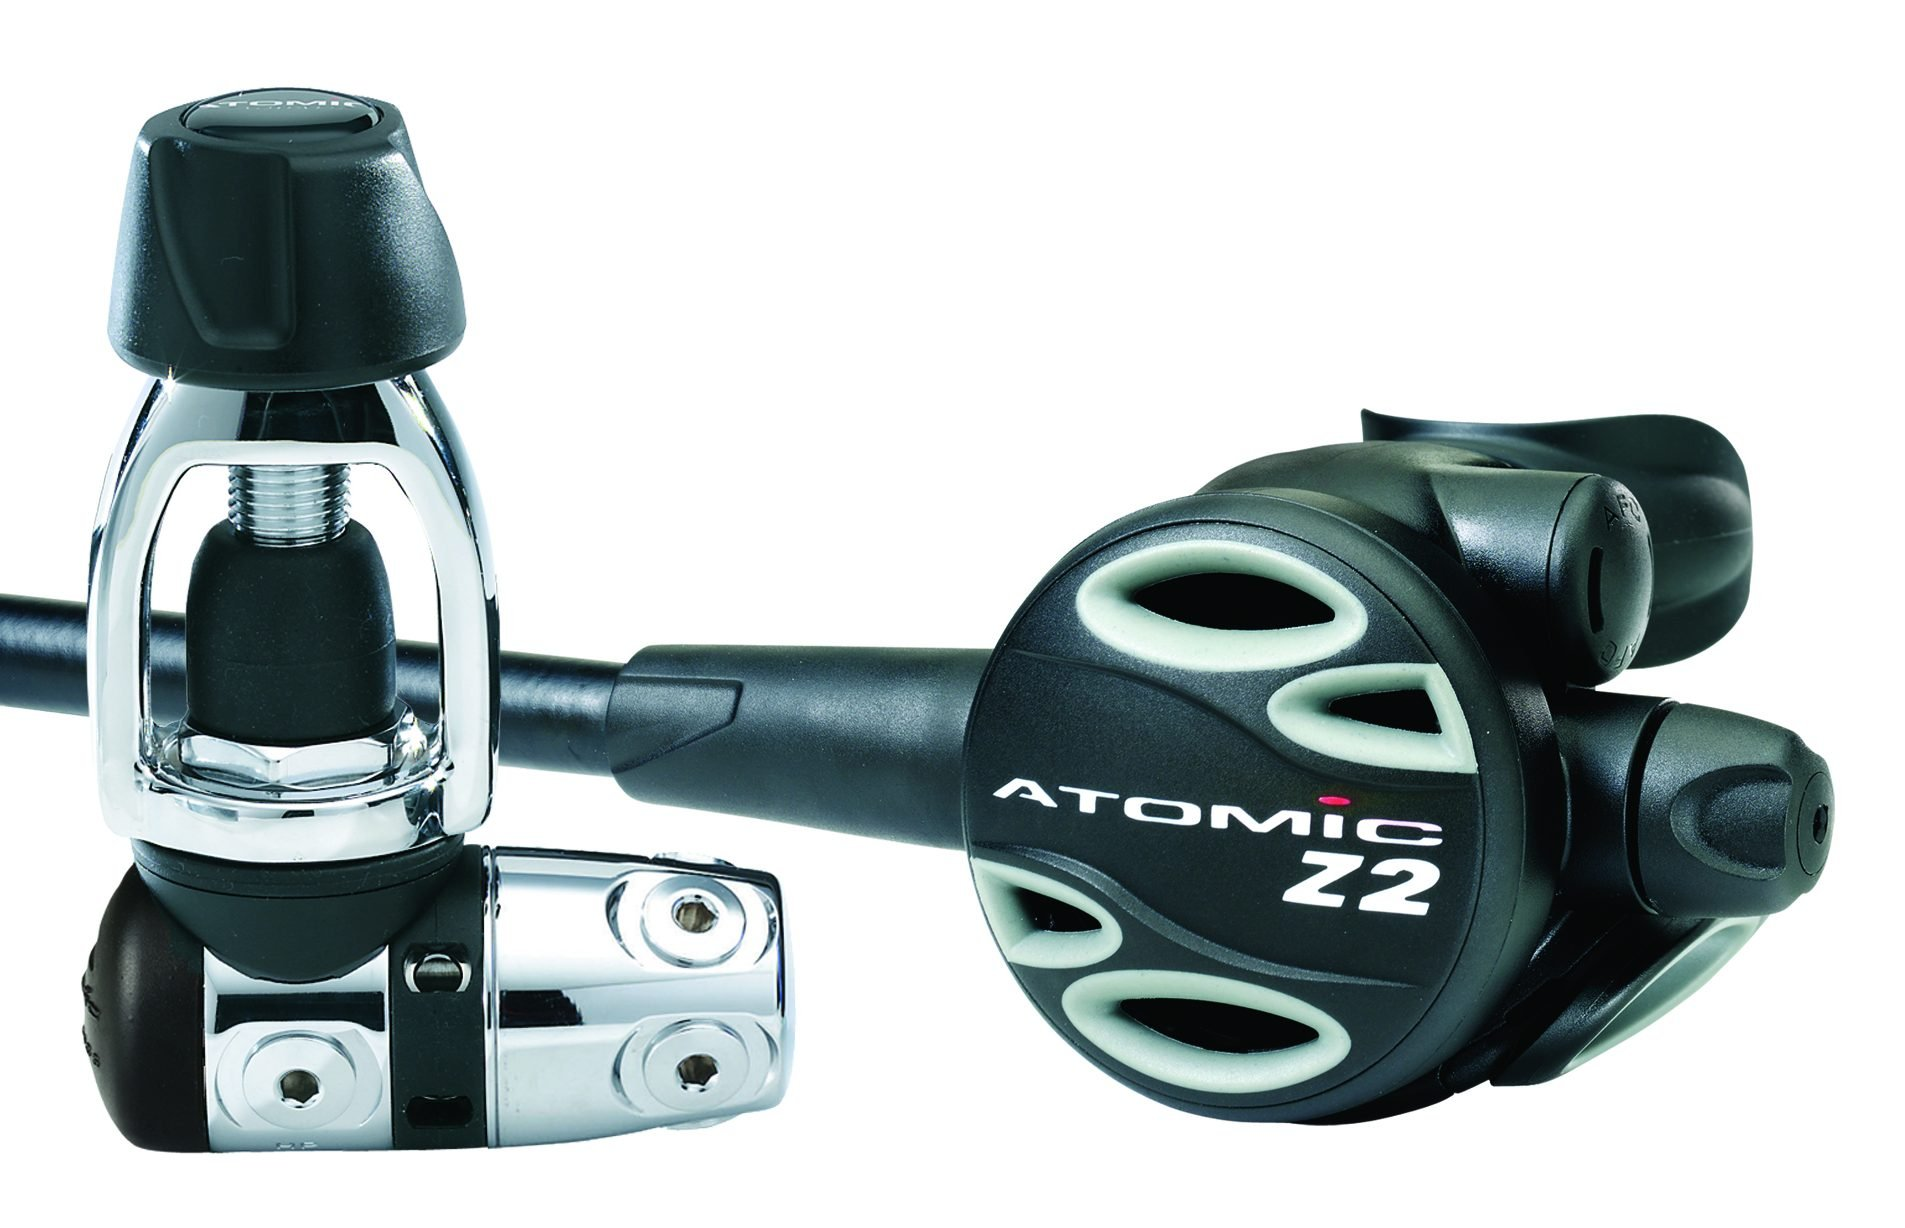 Atomic Z2 Regulator